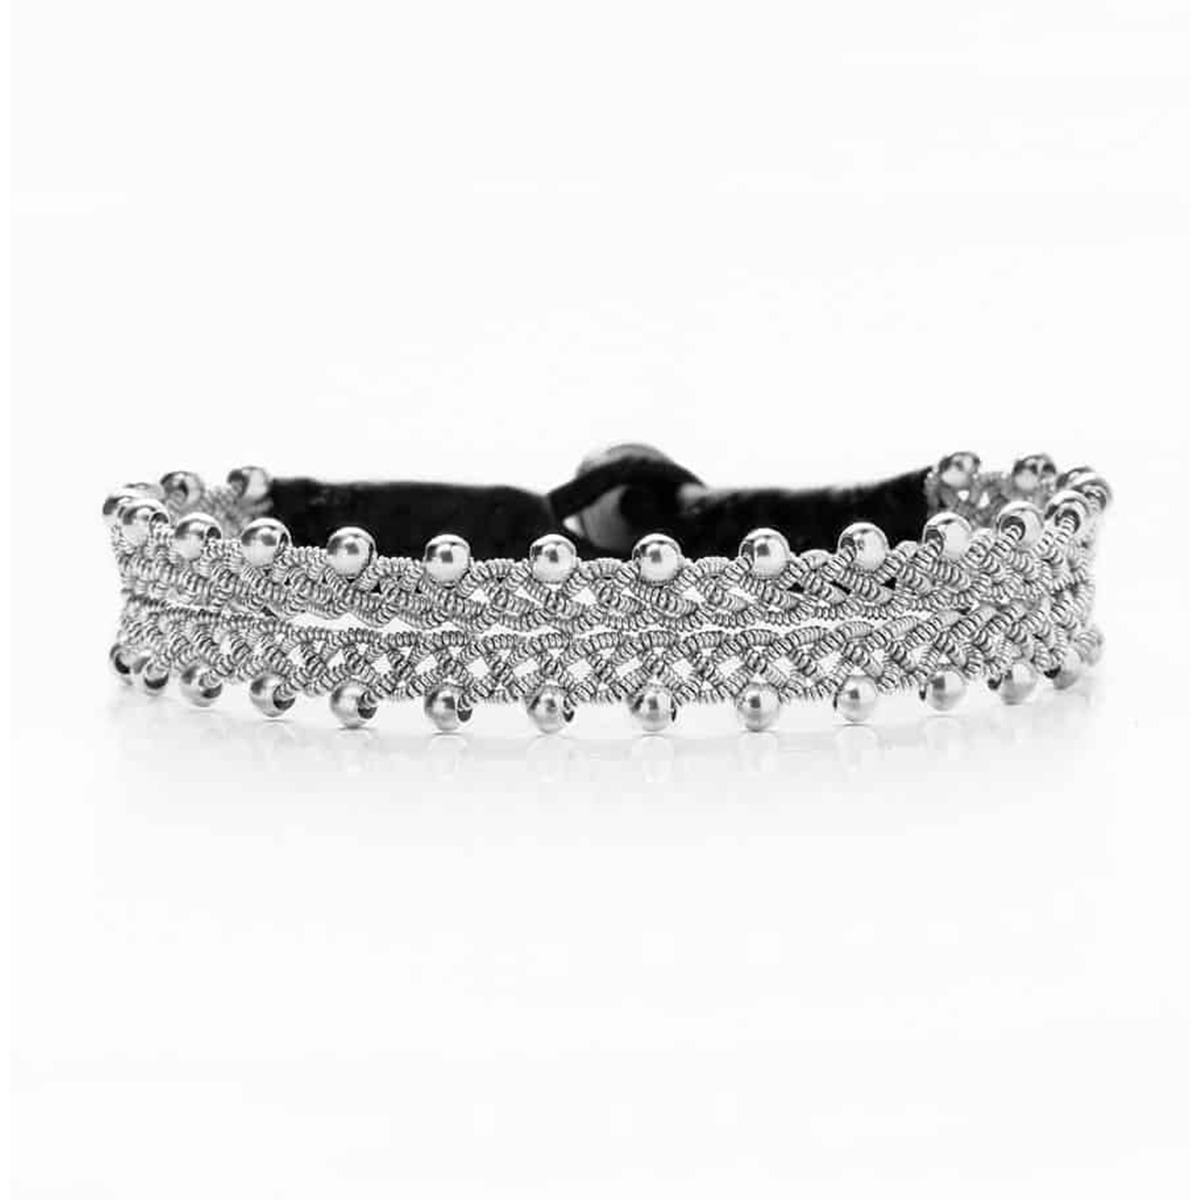 Designtorget Armband tenn/silver 19